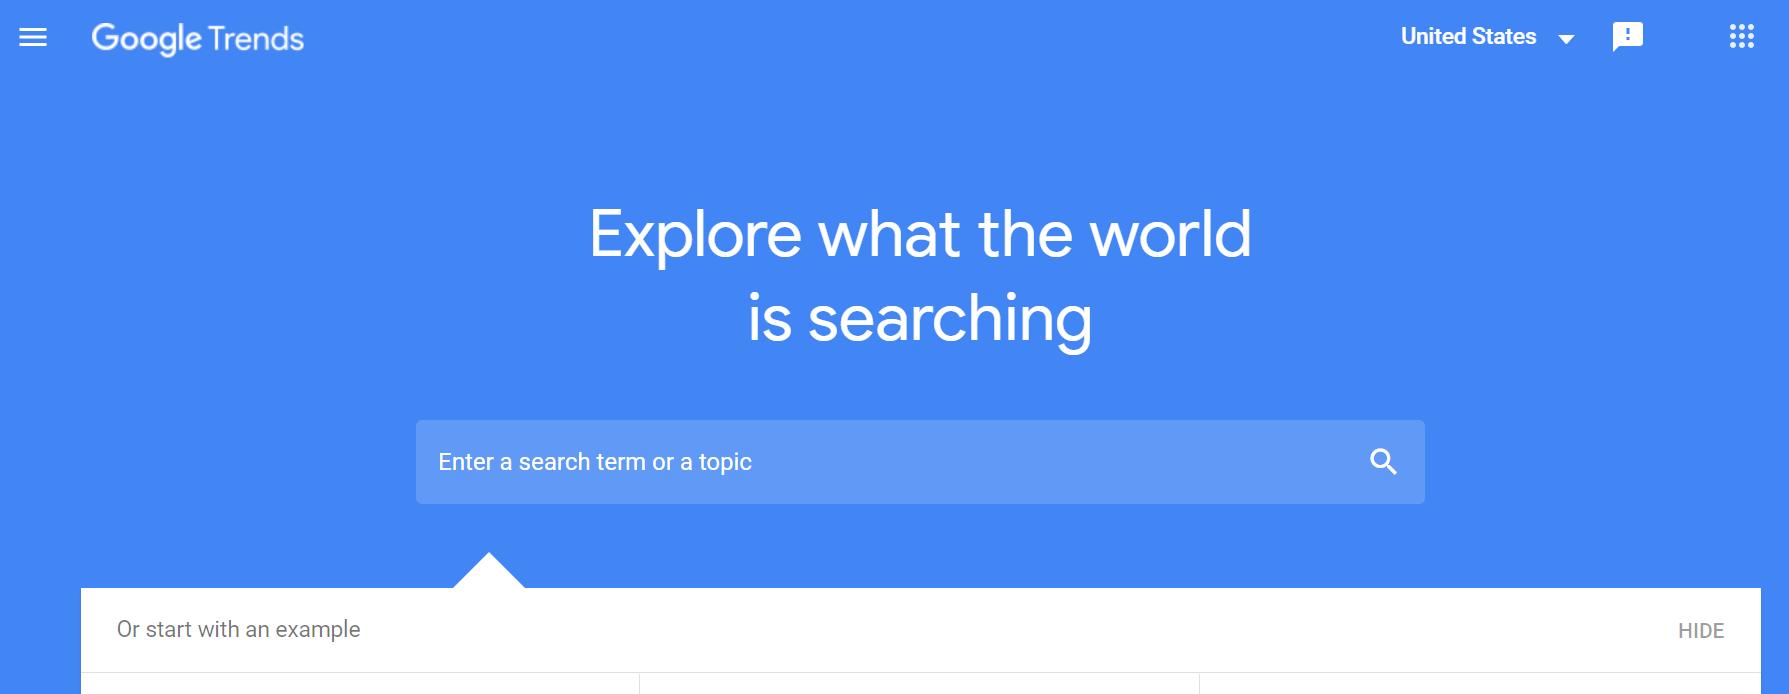 Google trends blogging tool for newbie cannabis writers homepage screenshot.